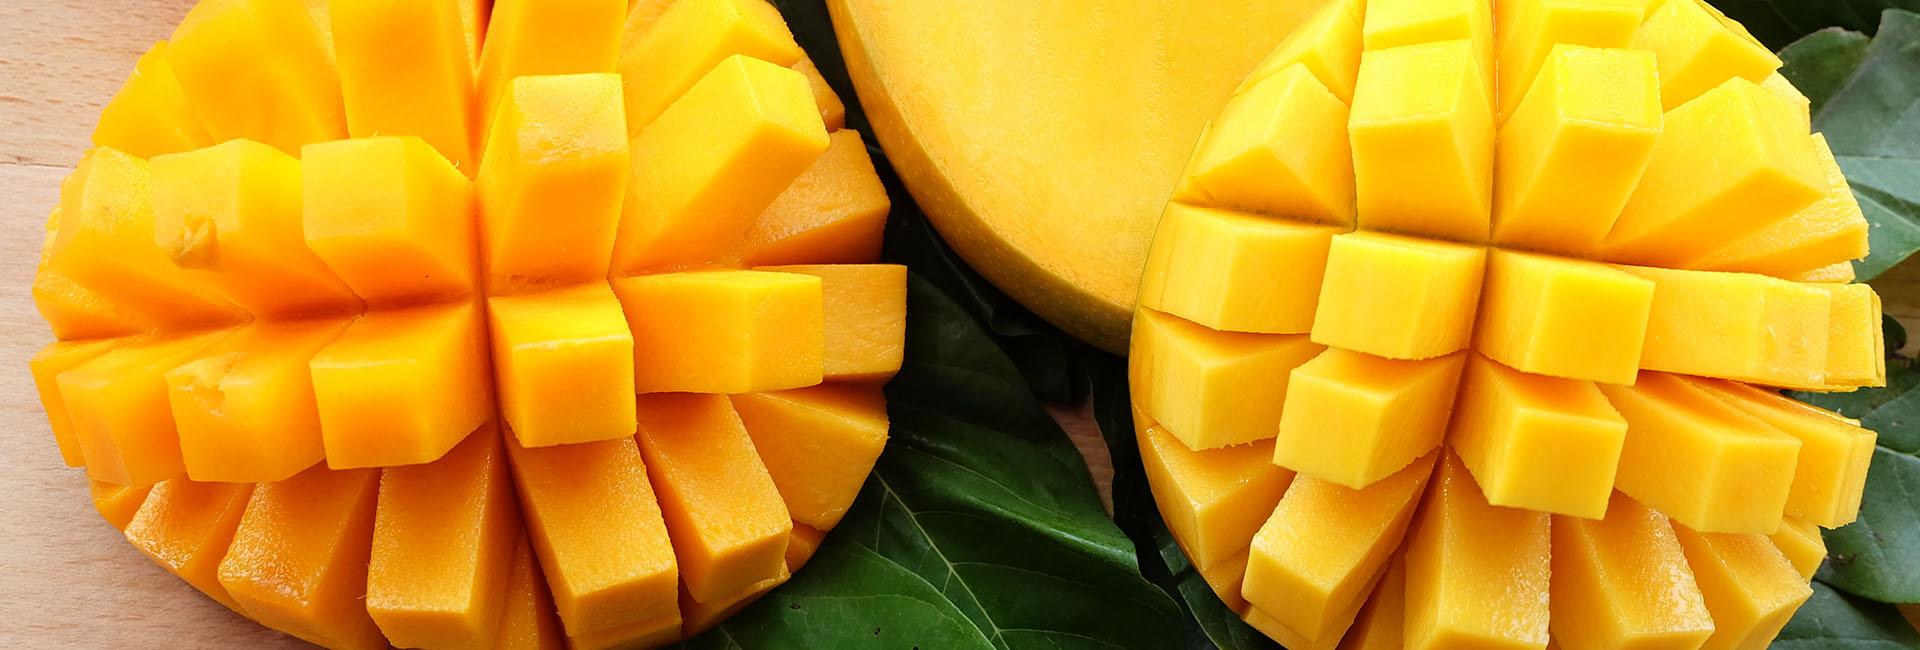 Favco Mango